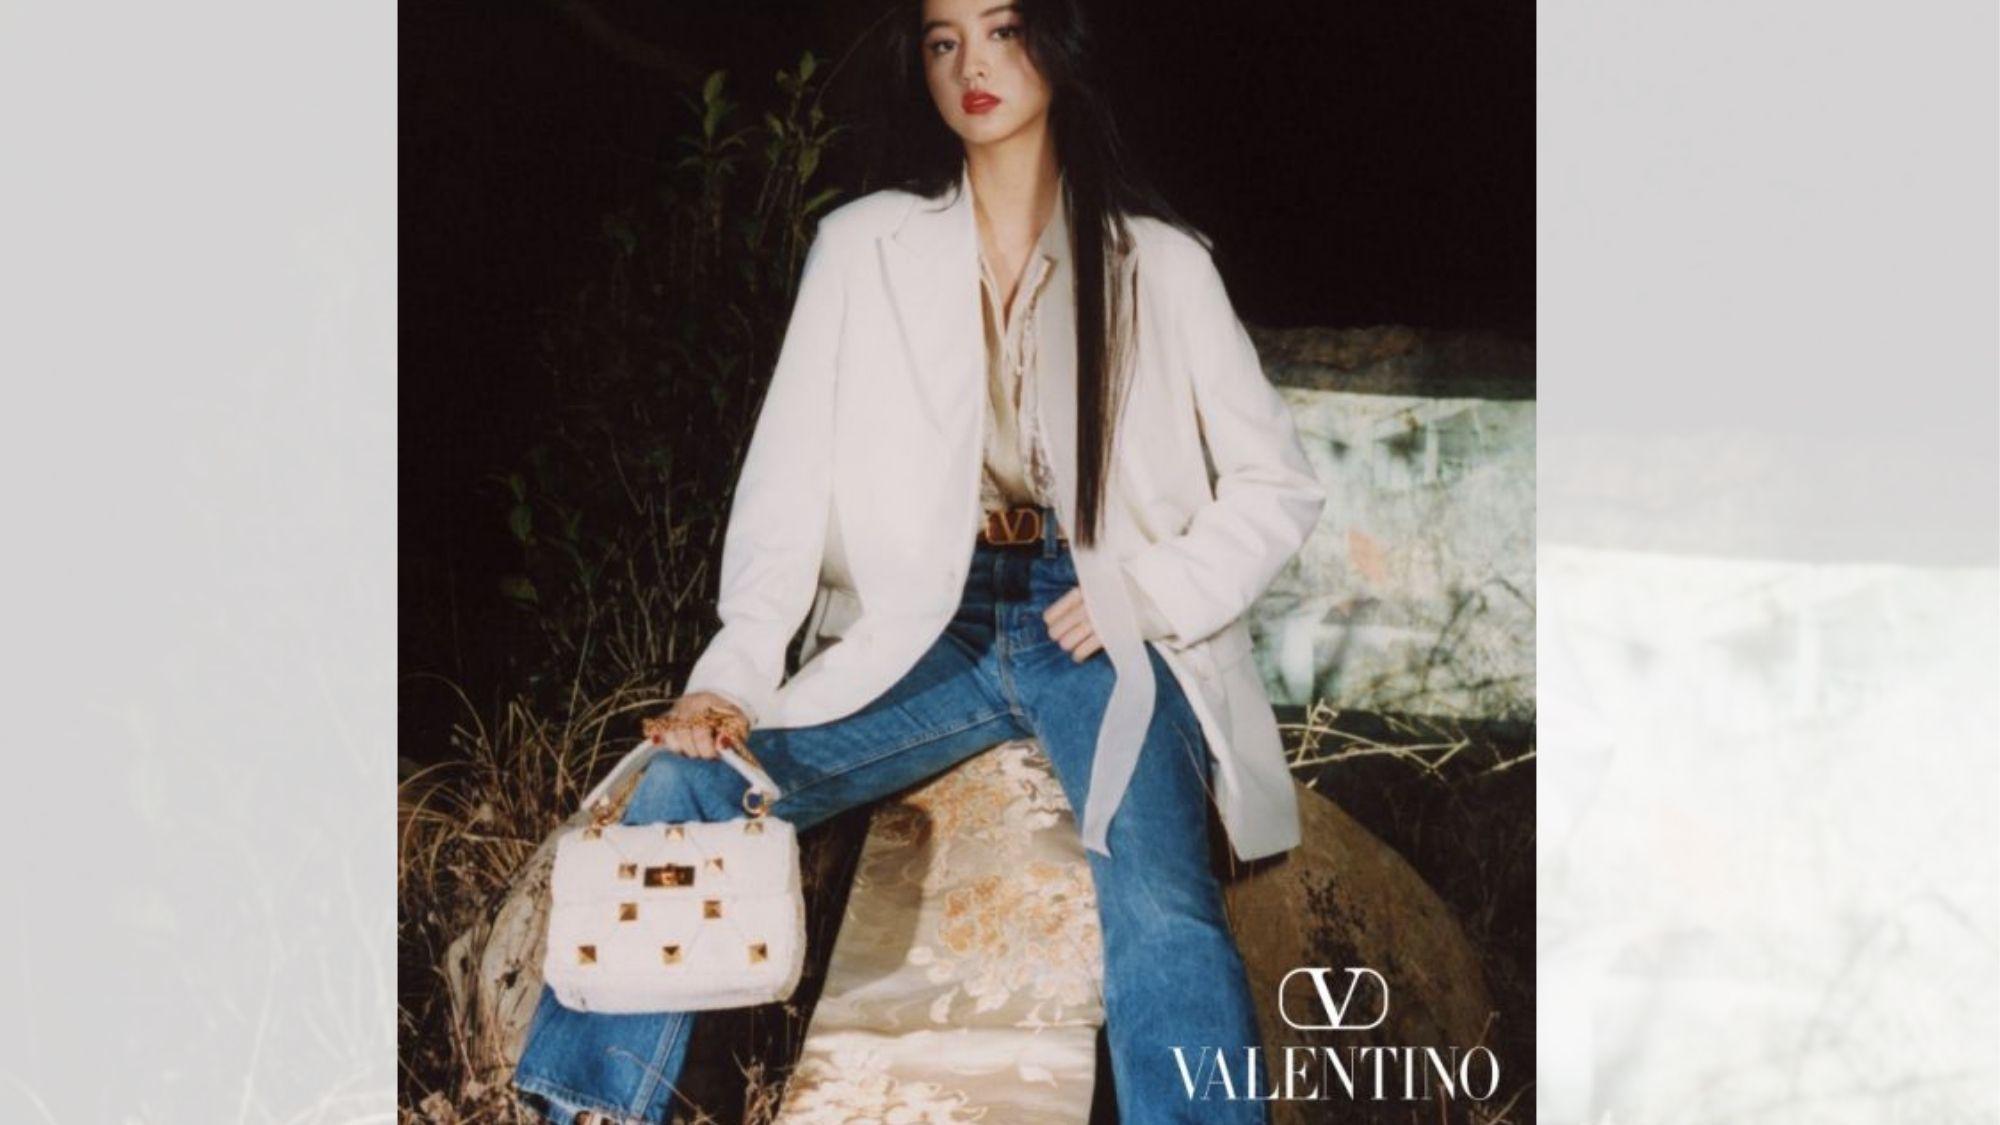 Japanese purists slam Valentino for disrespecting kimono